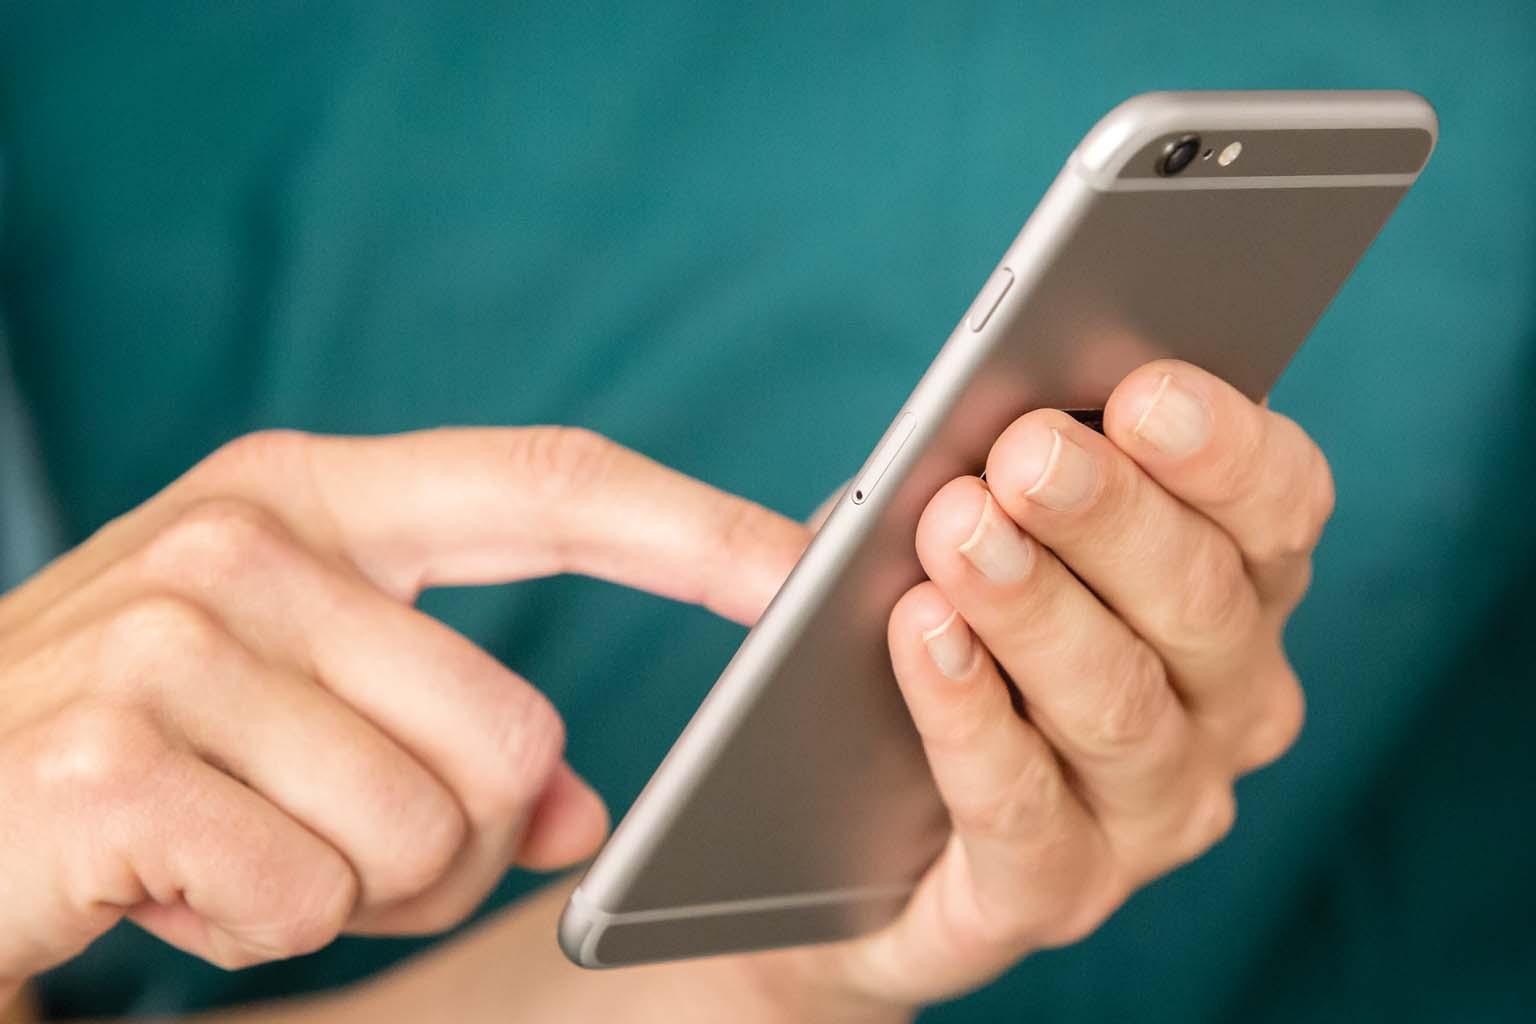 closeup of person using smartphone